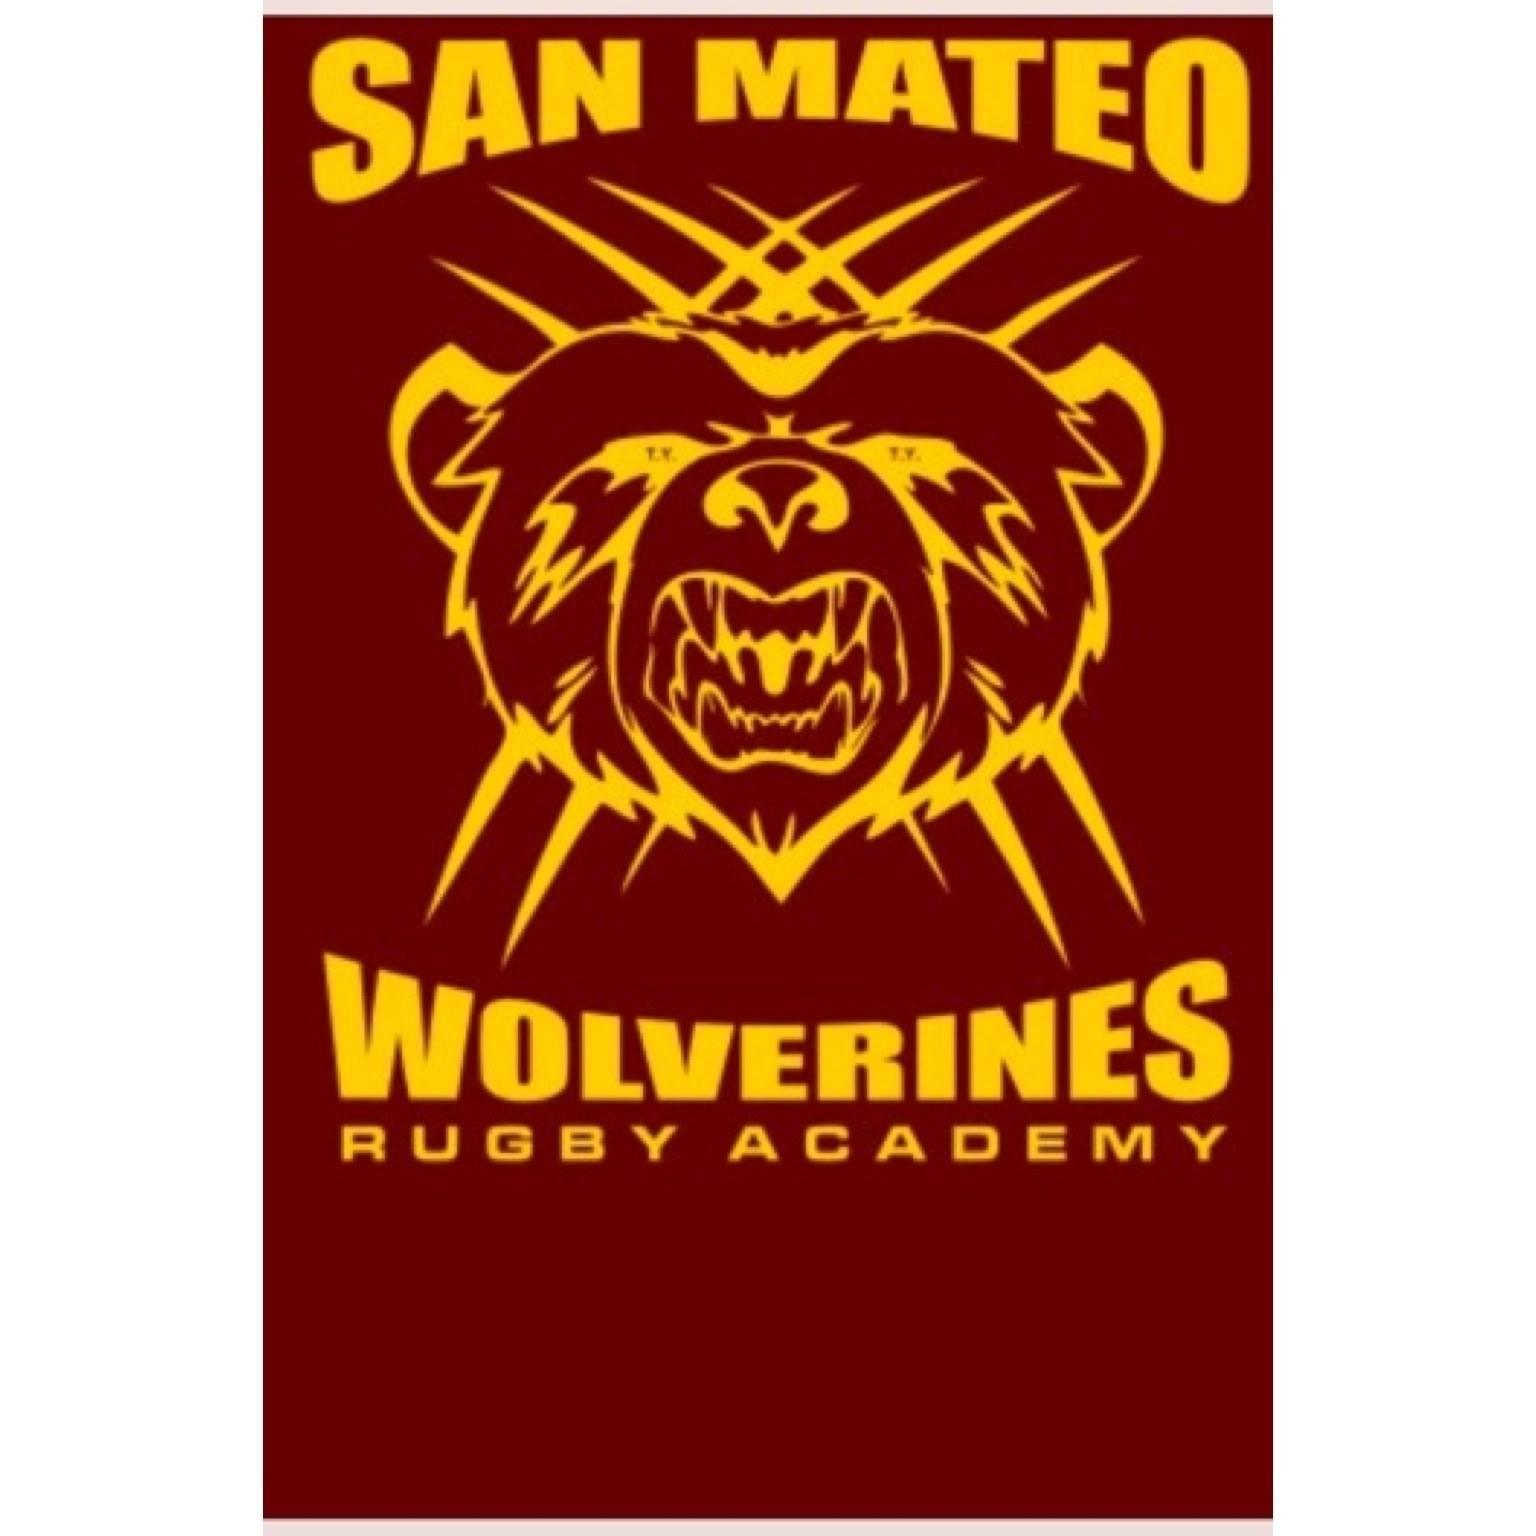 San Mateo Rugby Academy